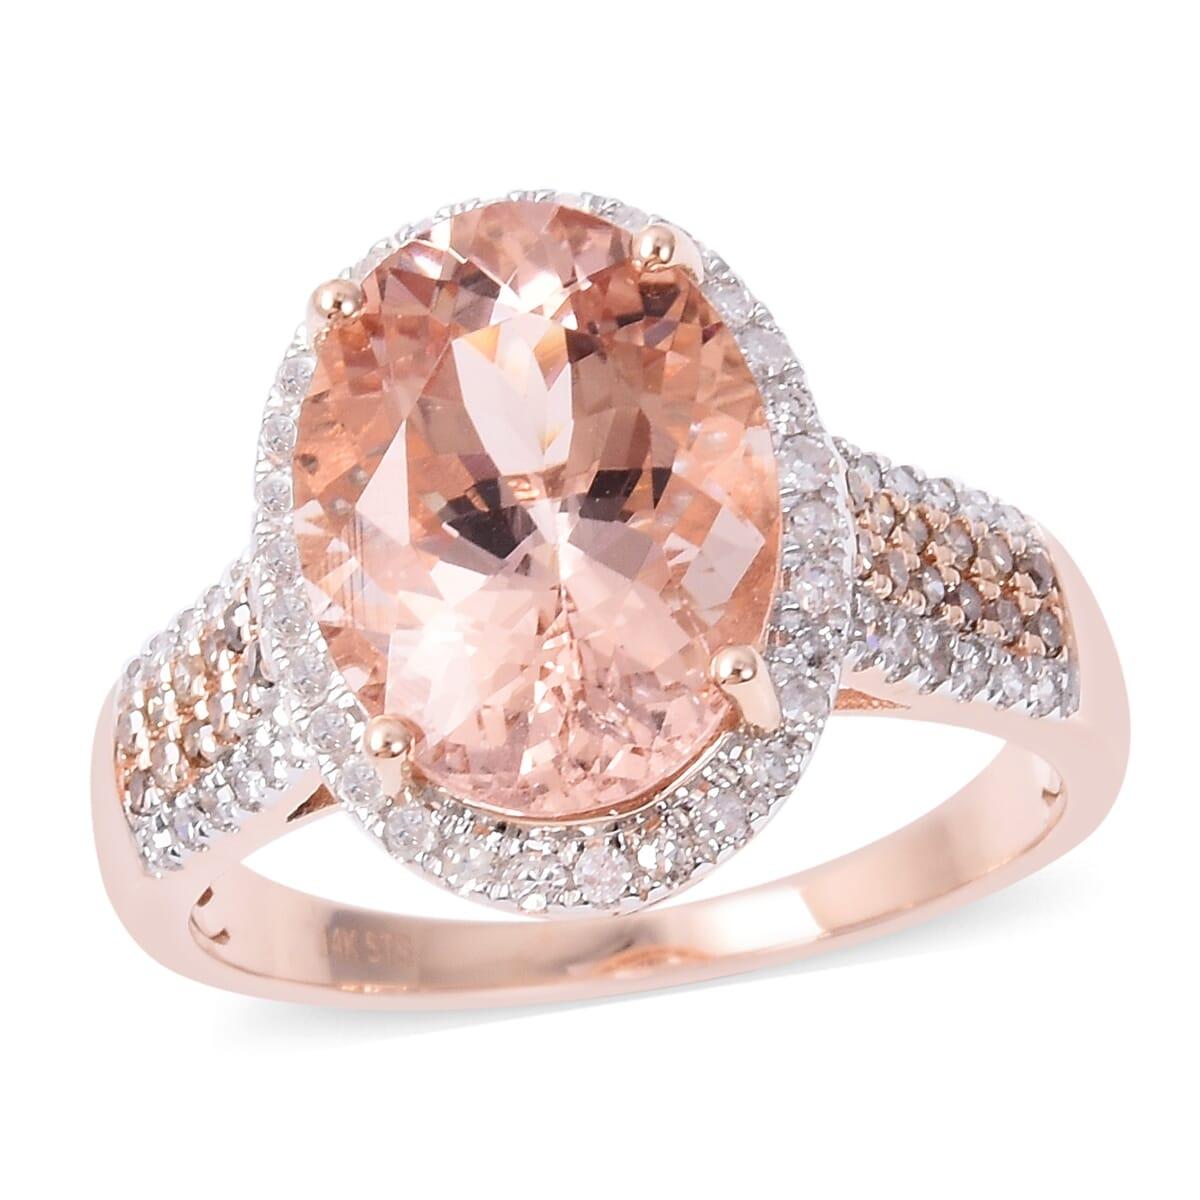 342c19597eb9f Marropino Morganite, Natural Champagne Diamond, Diamond Ring (Size 7.0) in  14K Rose Gold 6.05 ctw